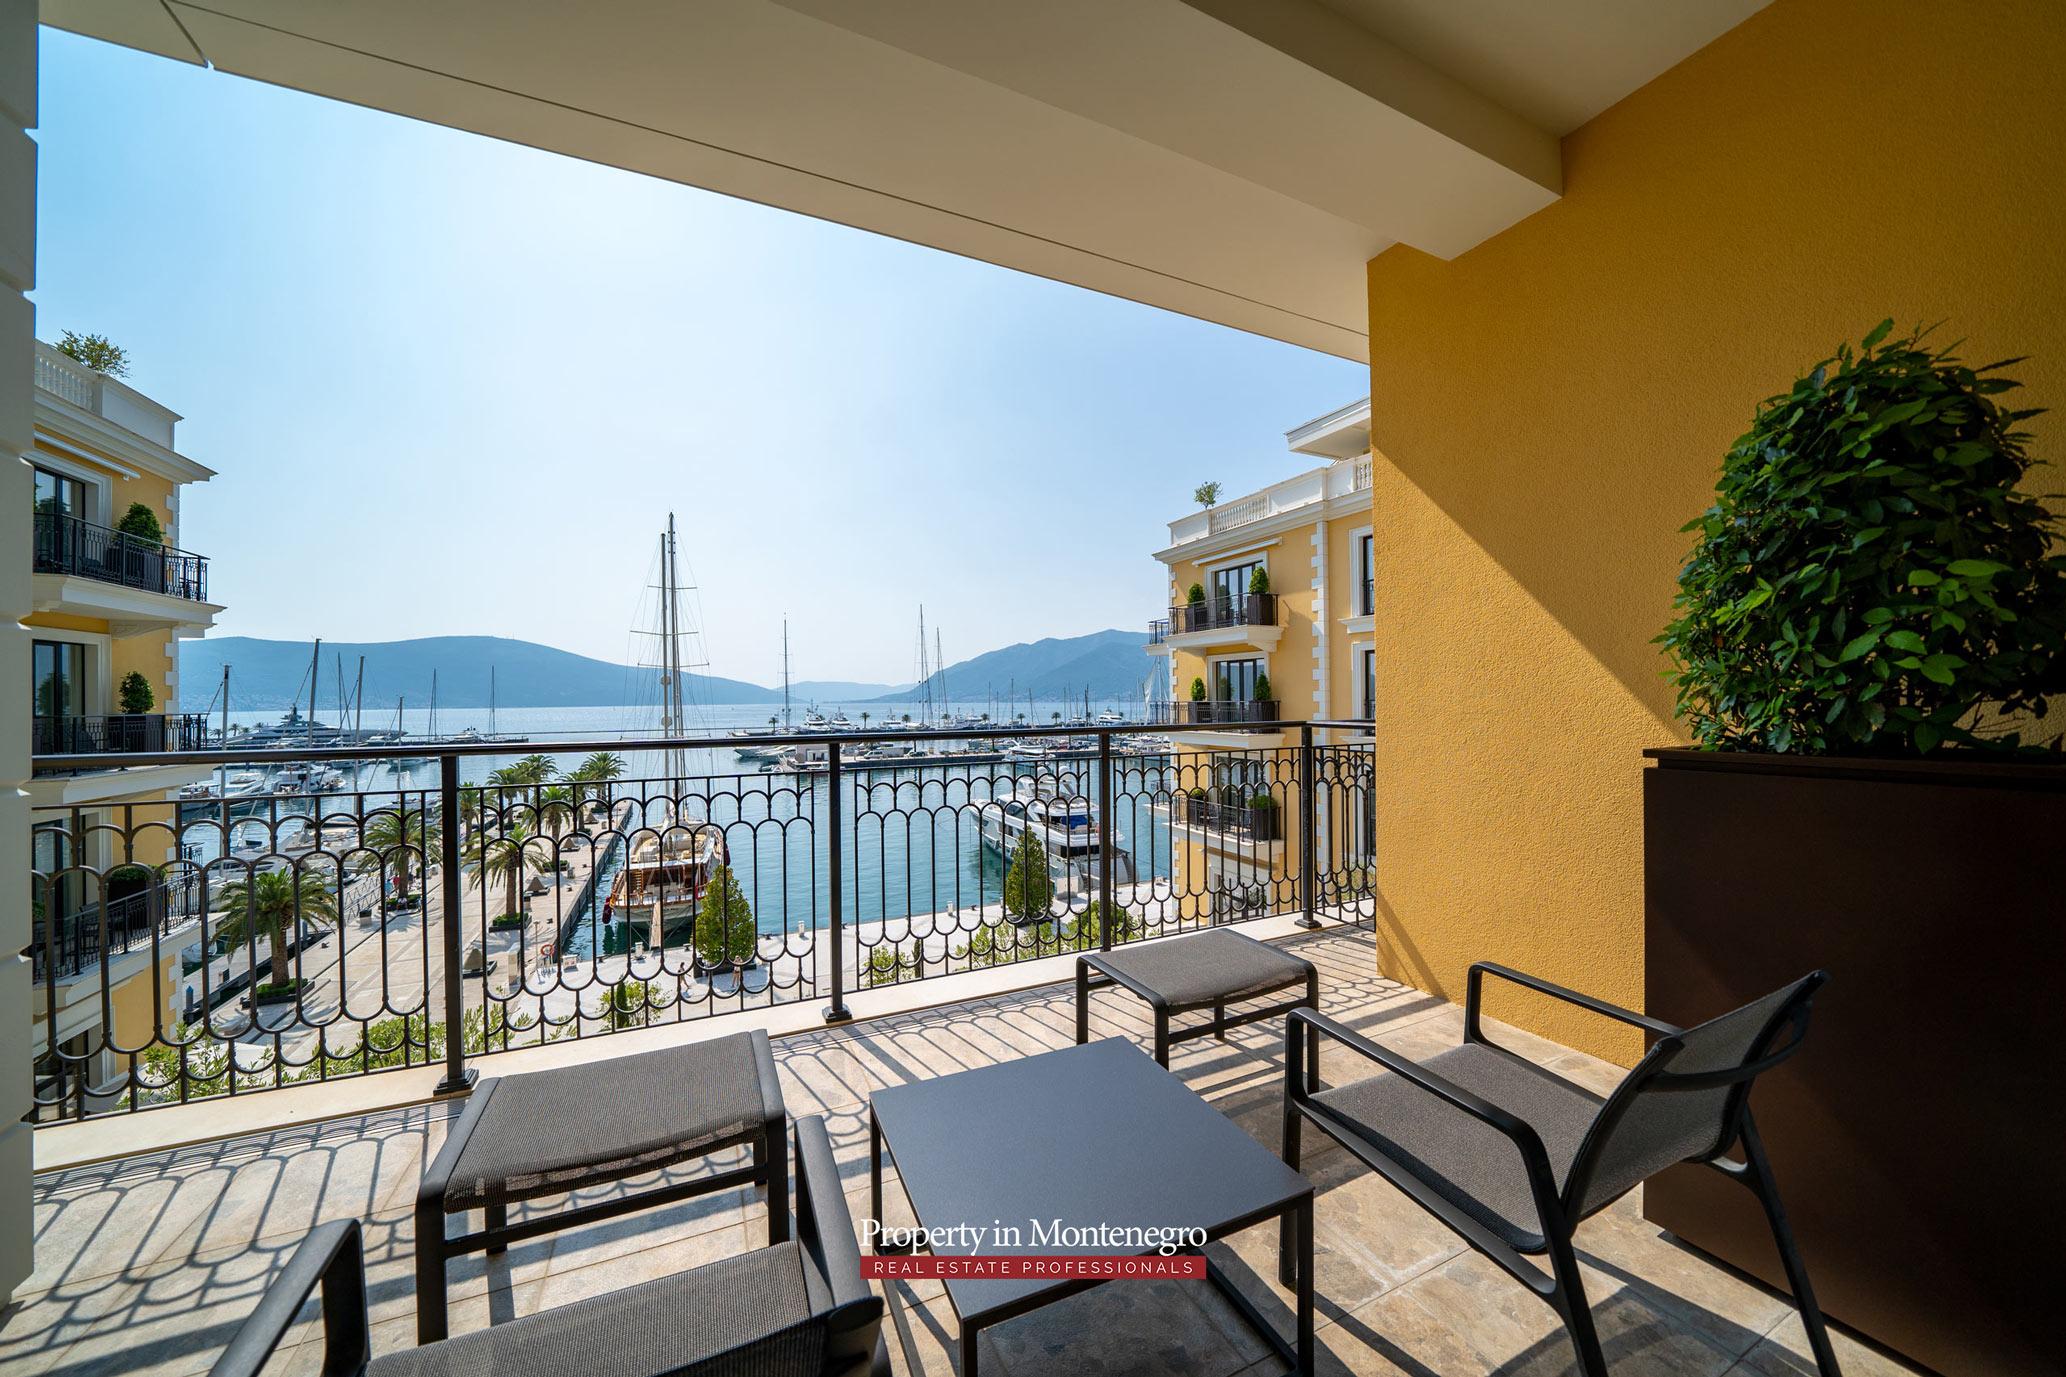 Luxury-two-bedroom-apartment-for-sale-in-Porto-Montenegro